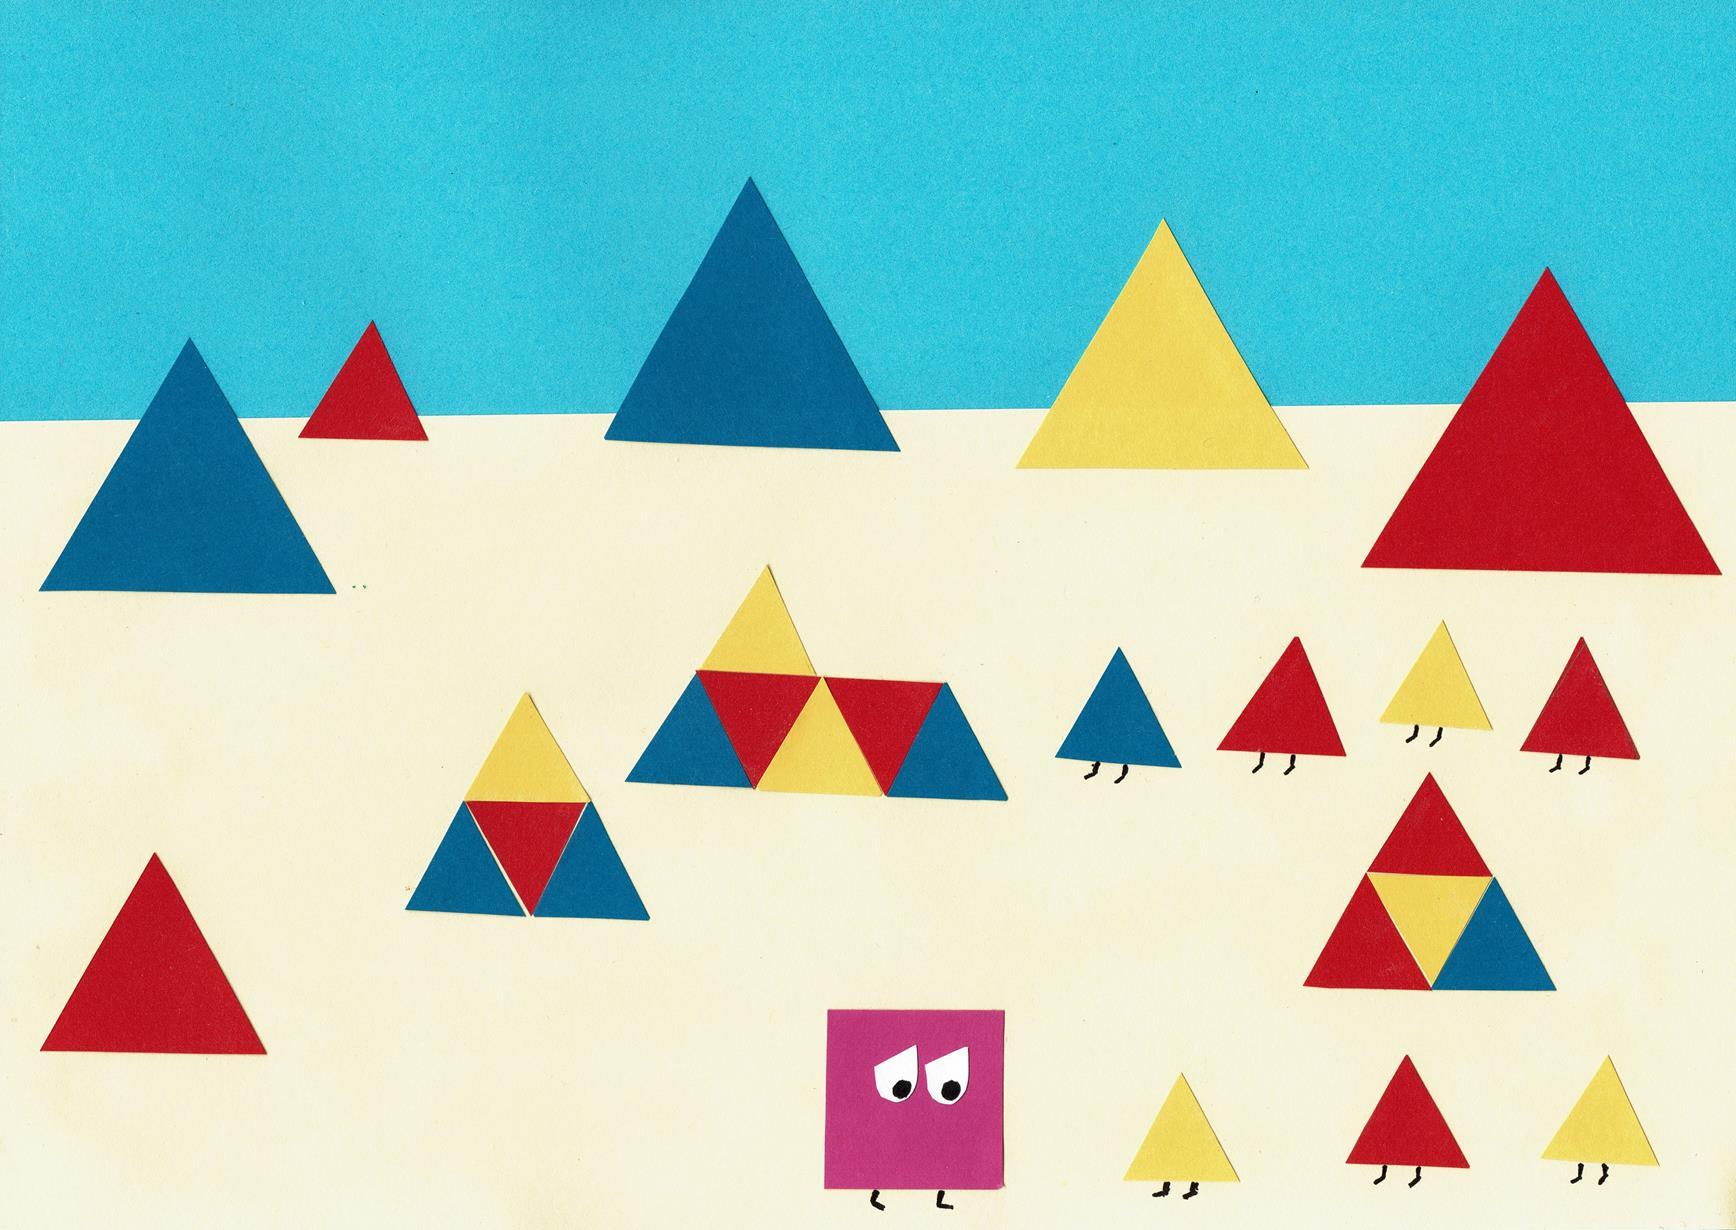 06. Bild Pyramiden (Copy)